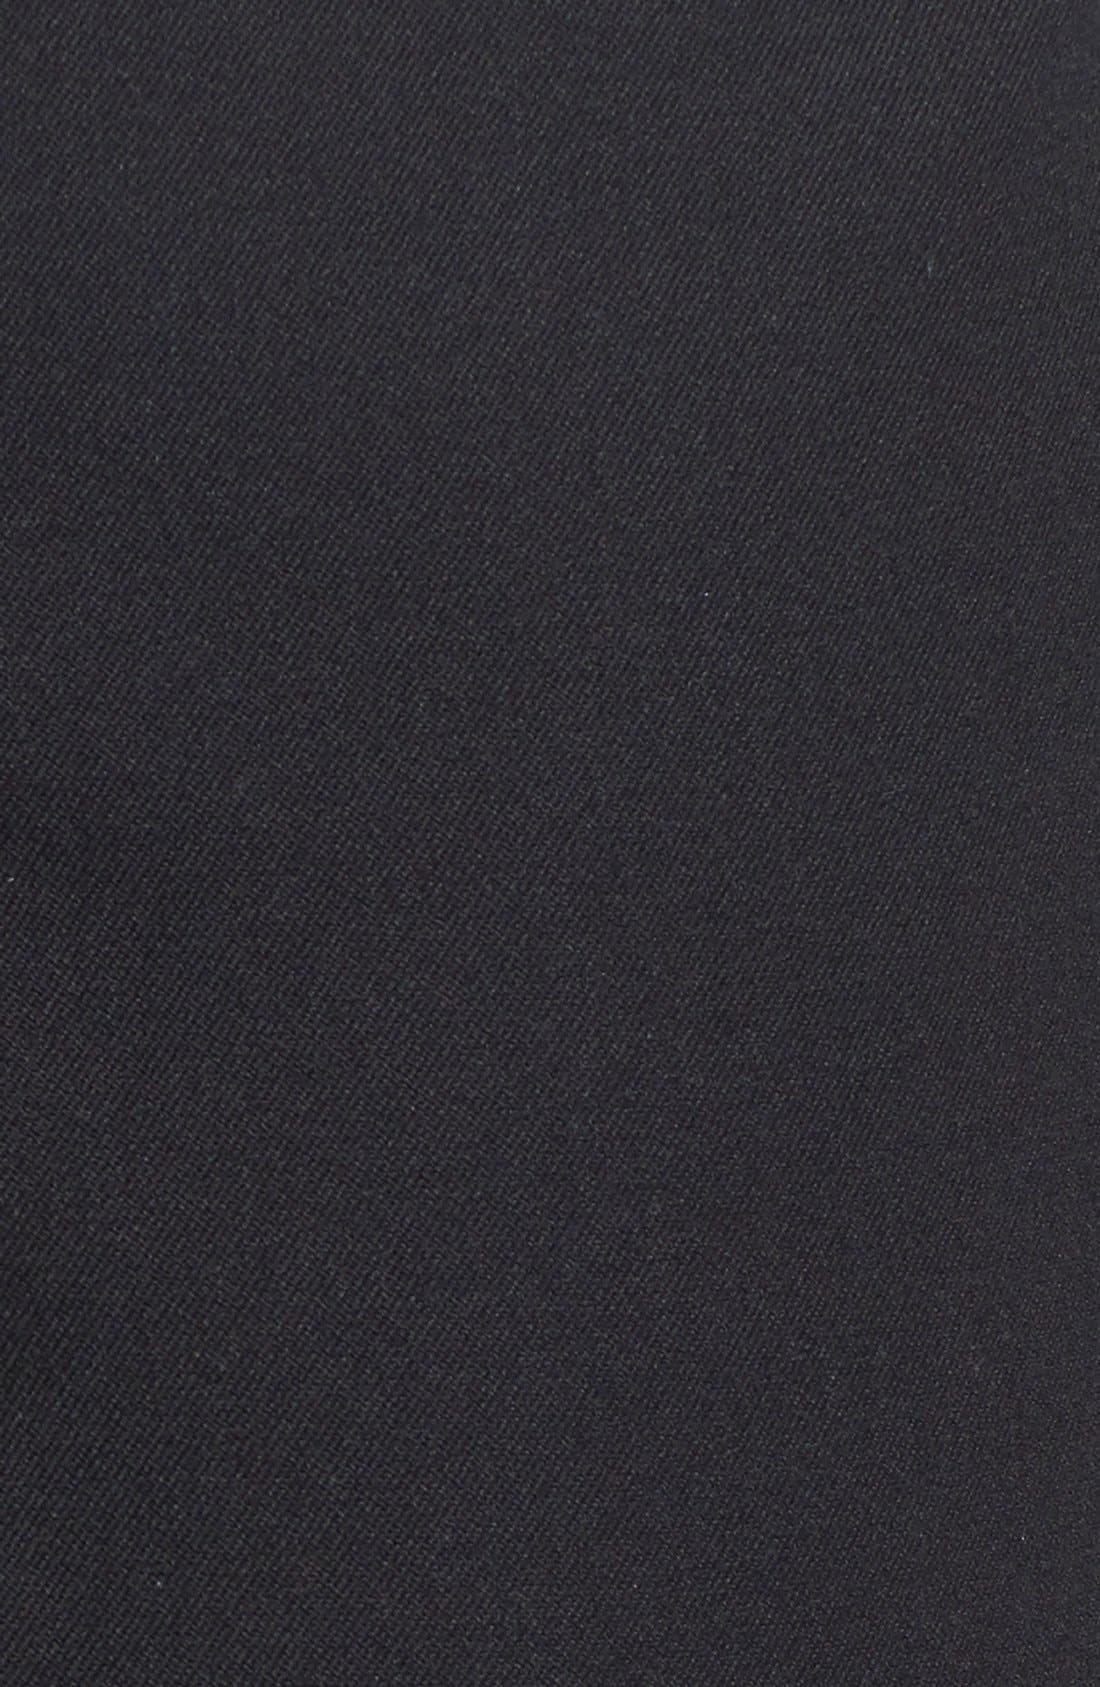 Woven Slim Ankle Pants,                             Alternate thumbnail 11, color,                             BLACK